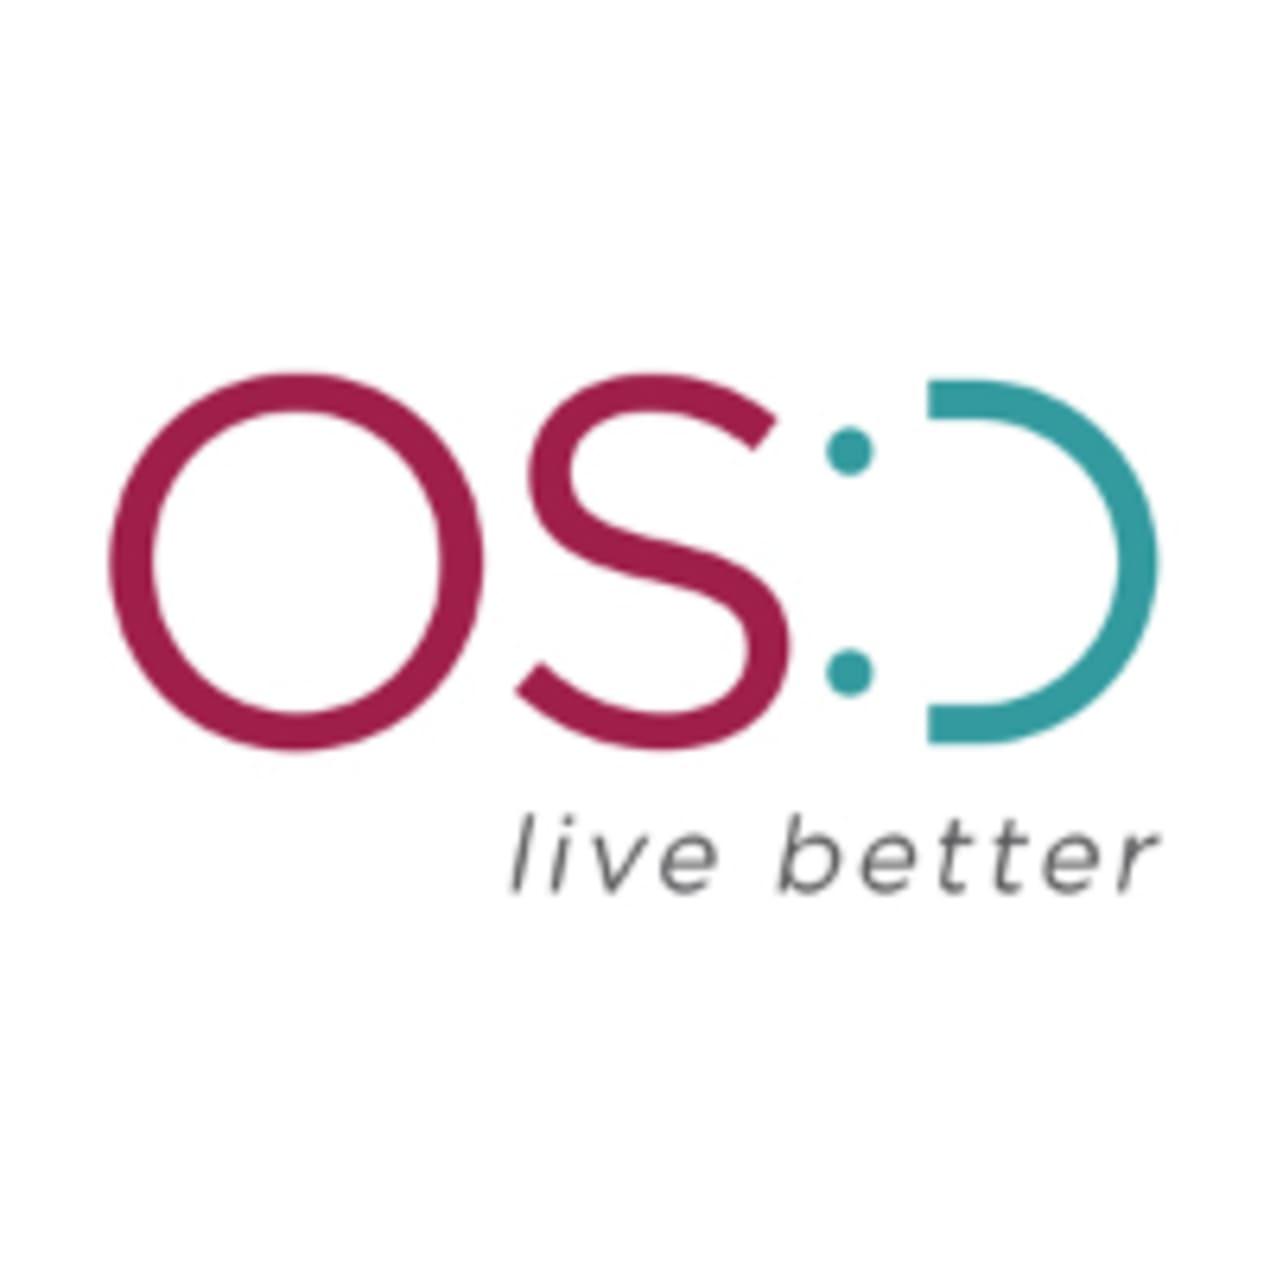 Orchard Scotts Dental undefined